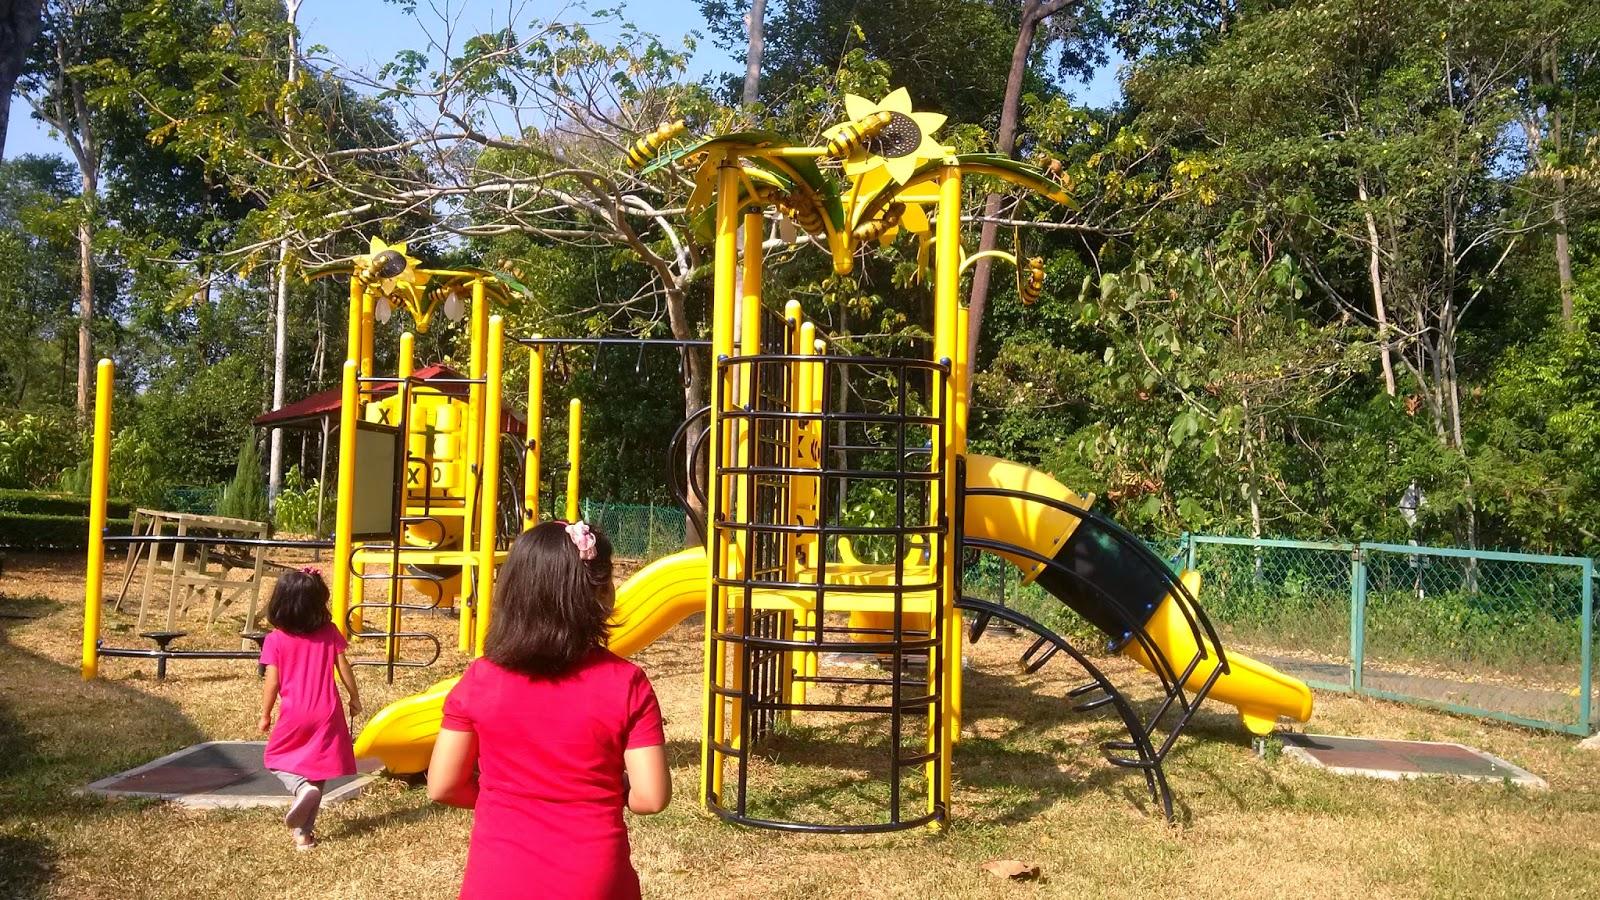 """malaysia travel influencer,  malaysia influencer,  blog with cris,  malaysia blogger,  malaysia freelance model,  bee farm melaka malaysia,  giant b propolis,  giant b honey benefits,  taman lebah melaka harga,  giant b royal jelly,  zoo melaka,  taman burung melaka,  buy honey online malaysia,  propolis malaysia supplier,  malaysia best honey,  melaka bird park ticket price 2019,  where to buy honeycomb in kl,  butterfly farm melaka,  bees museum,  ong super trading sdn bhd,  bee farm penang,  urban beekeeping malaysia,  bee farm selangor,  muzium lebah melaka,"